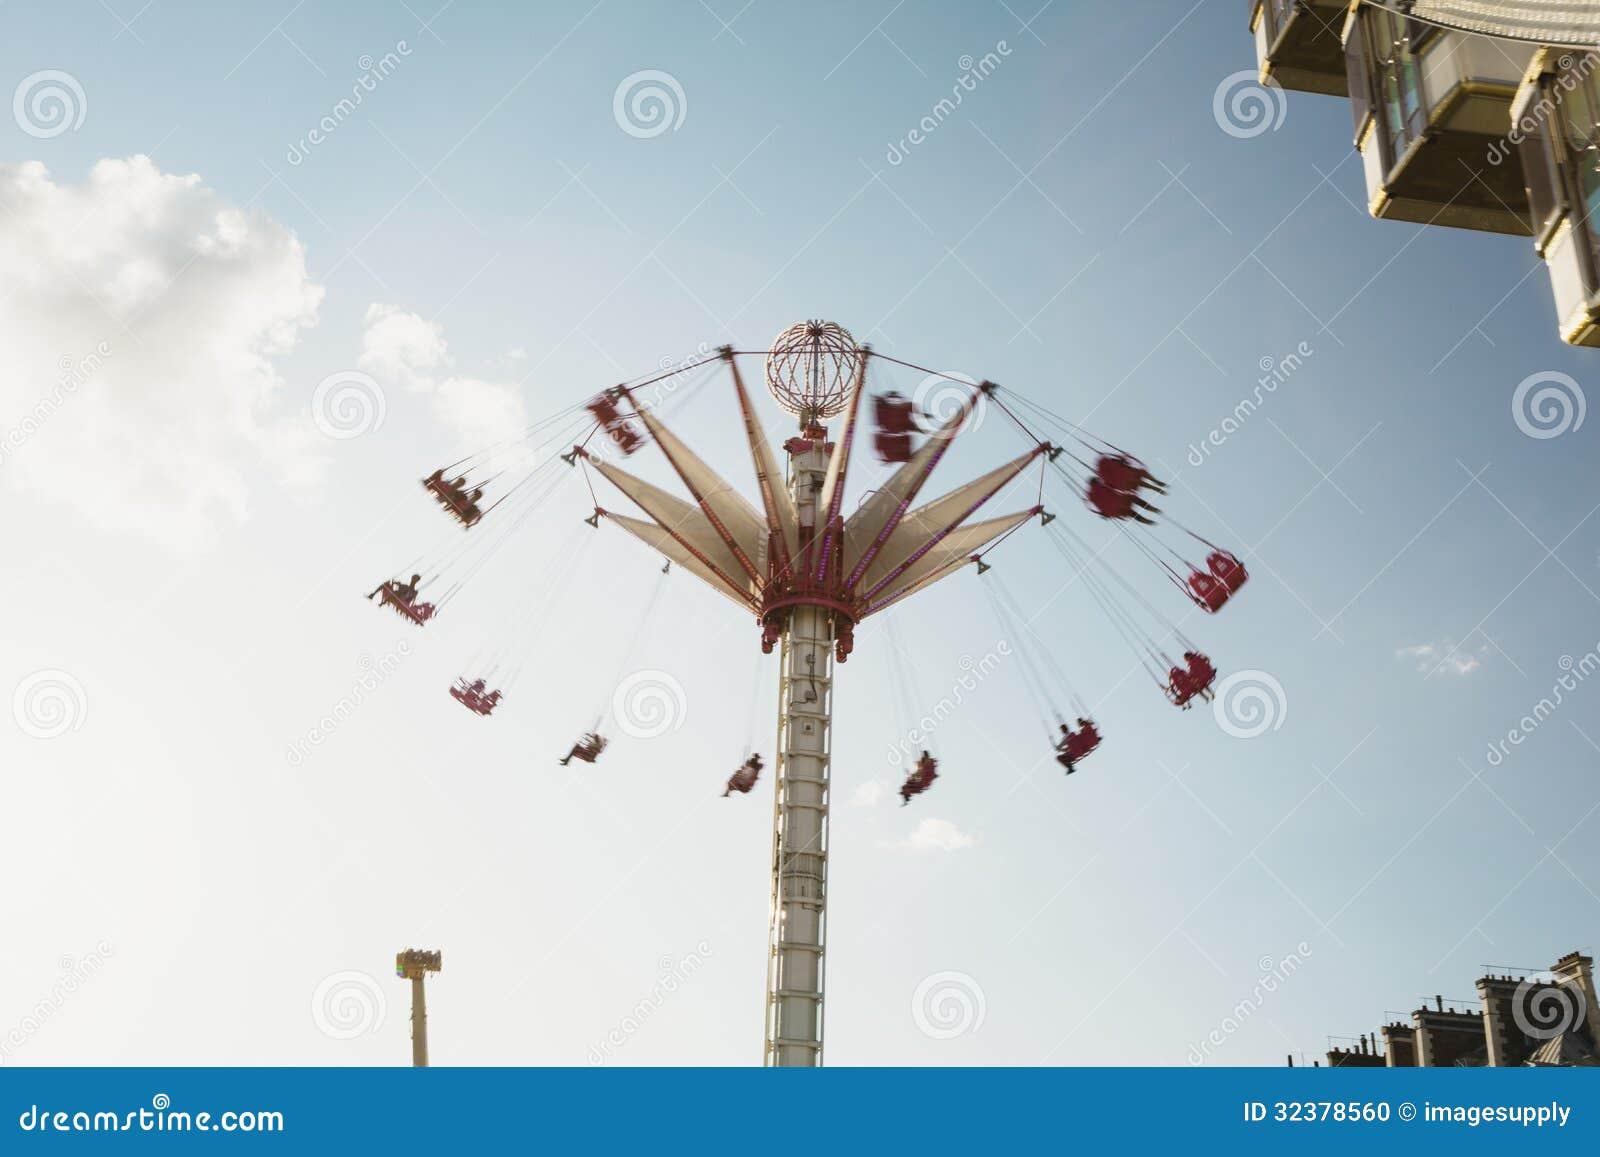 Carousel in paris editorial image image 32378560 for Amusement parks in paris